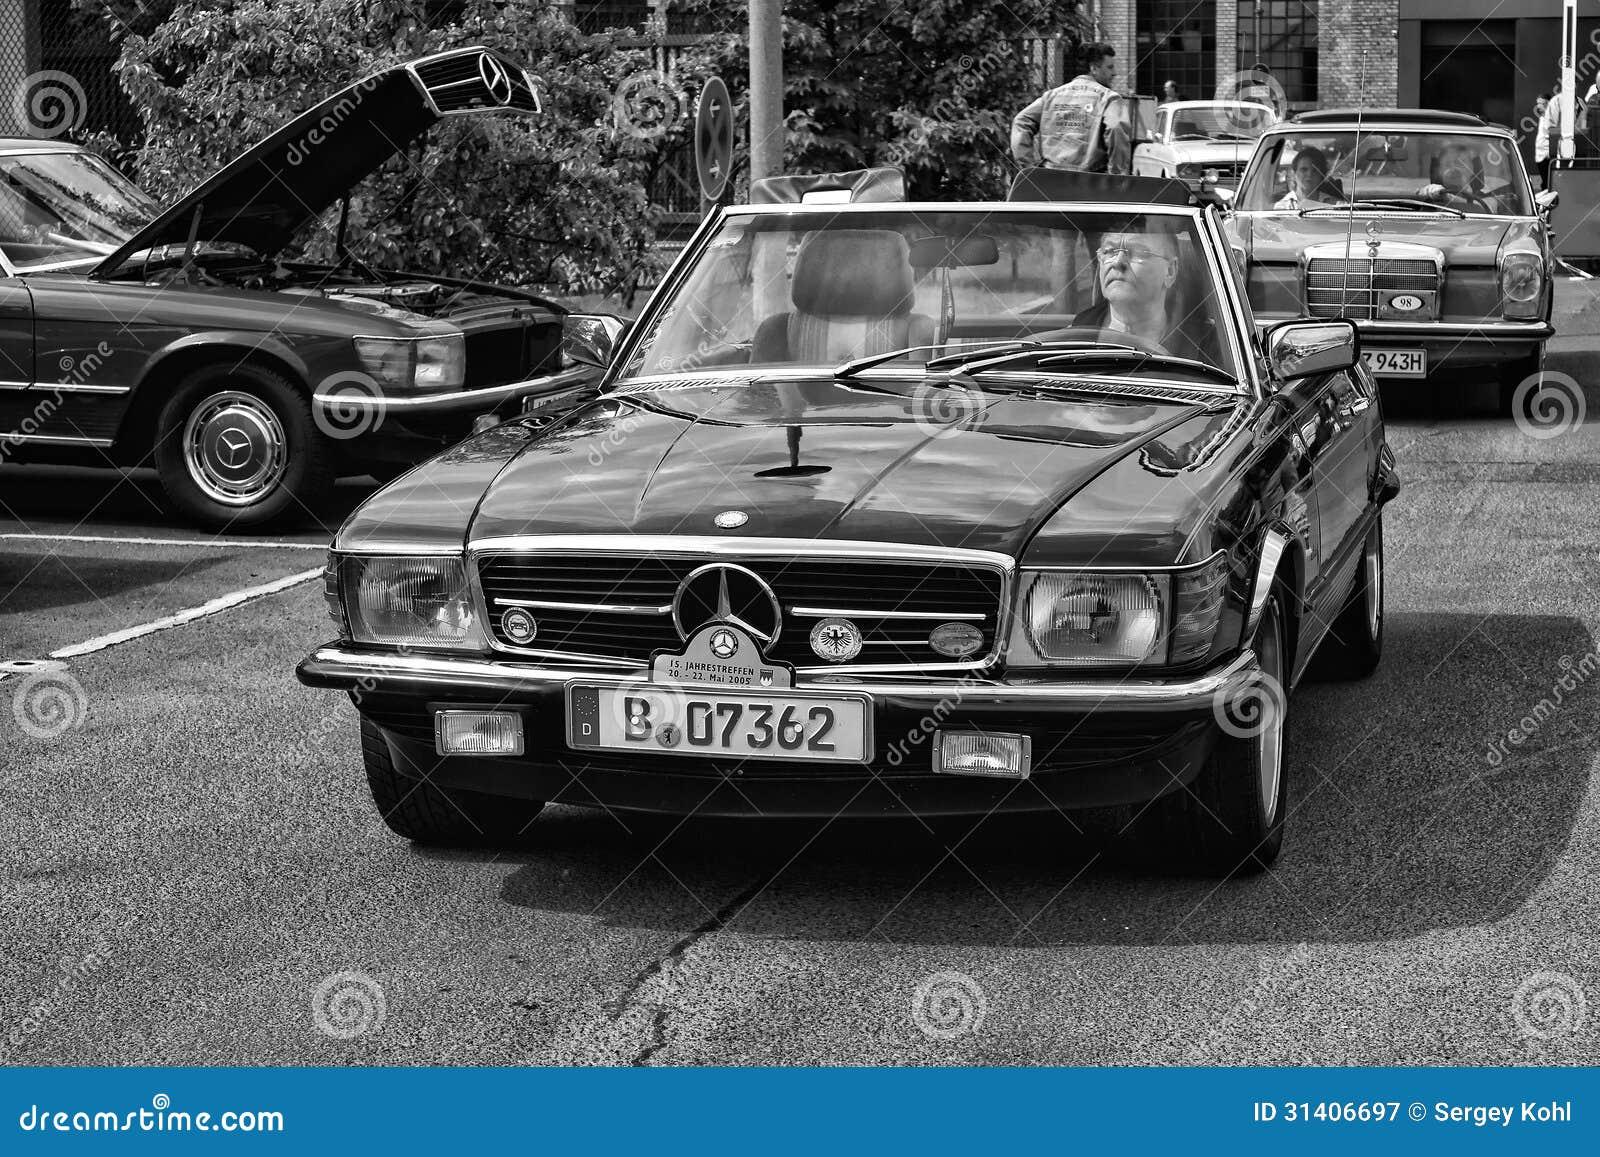 car mercedes benz r107 280sl black and white editorial. Black Bedroom Furniture Sets. Home Design Ideas